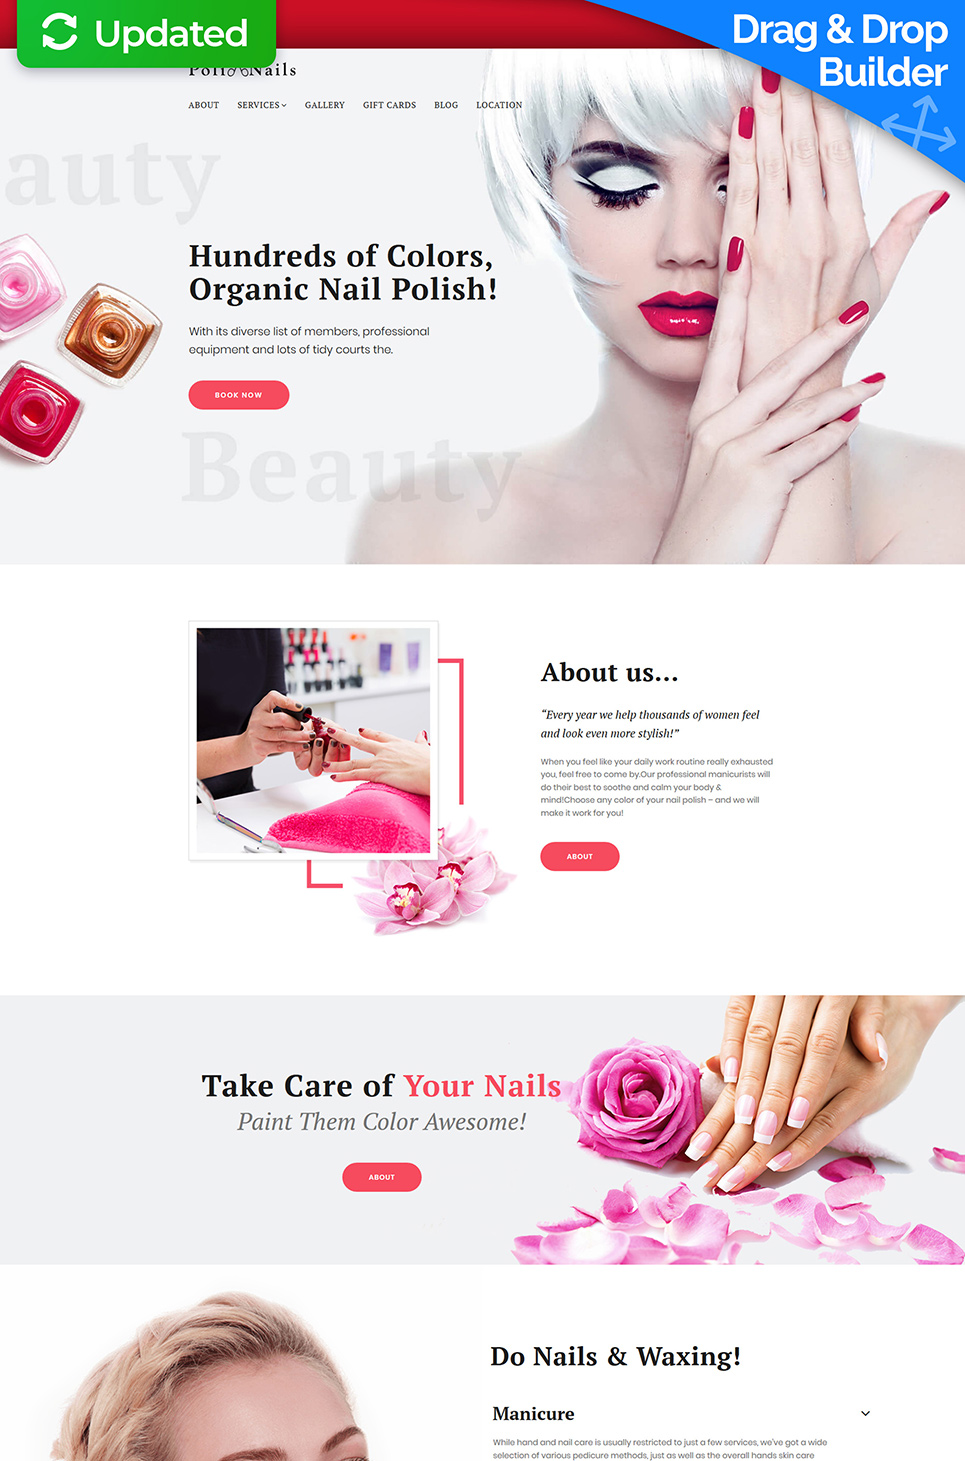 Demo Preview for Poli Nails - Nail Salon Moto CMS 3 Template